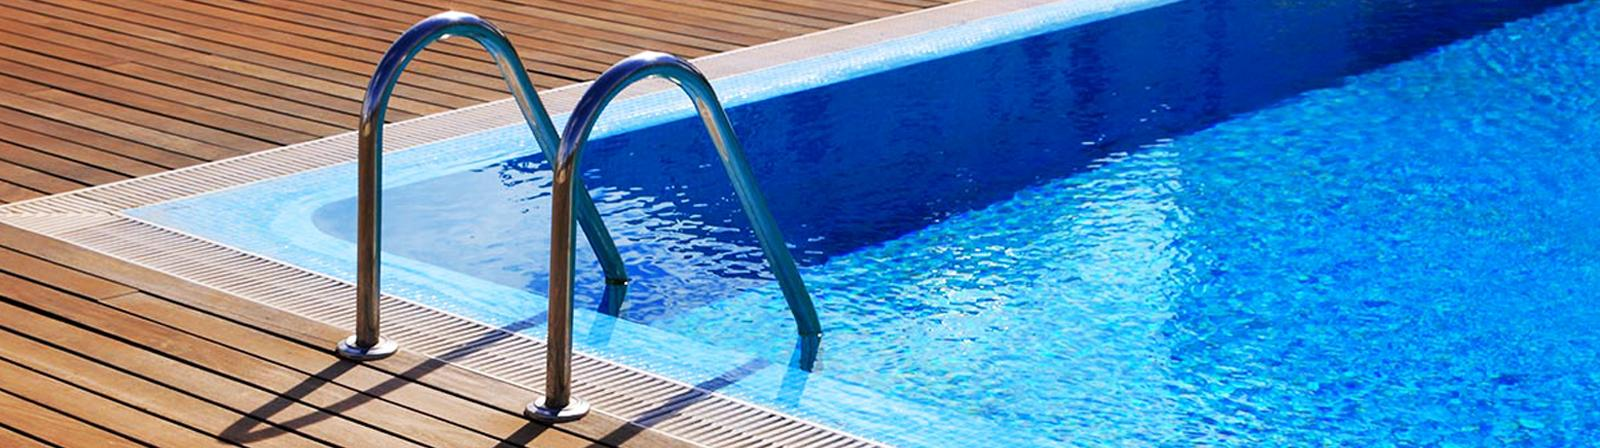 Escalera baranda pasamanos acero inoxidable piscina agua - Pasamanos escaleras acero inoxidable ...